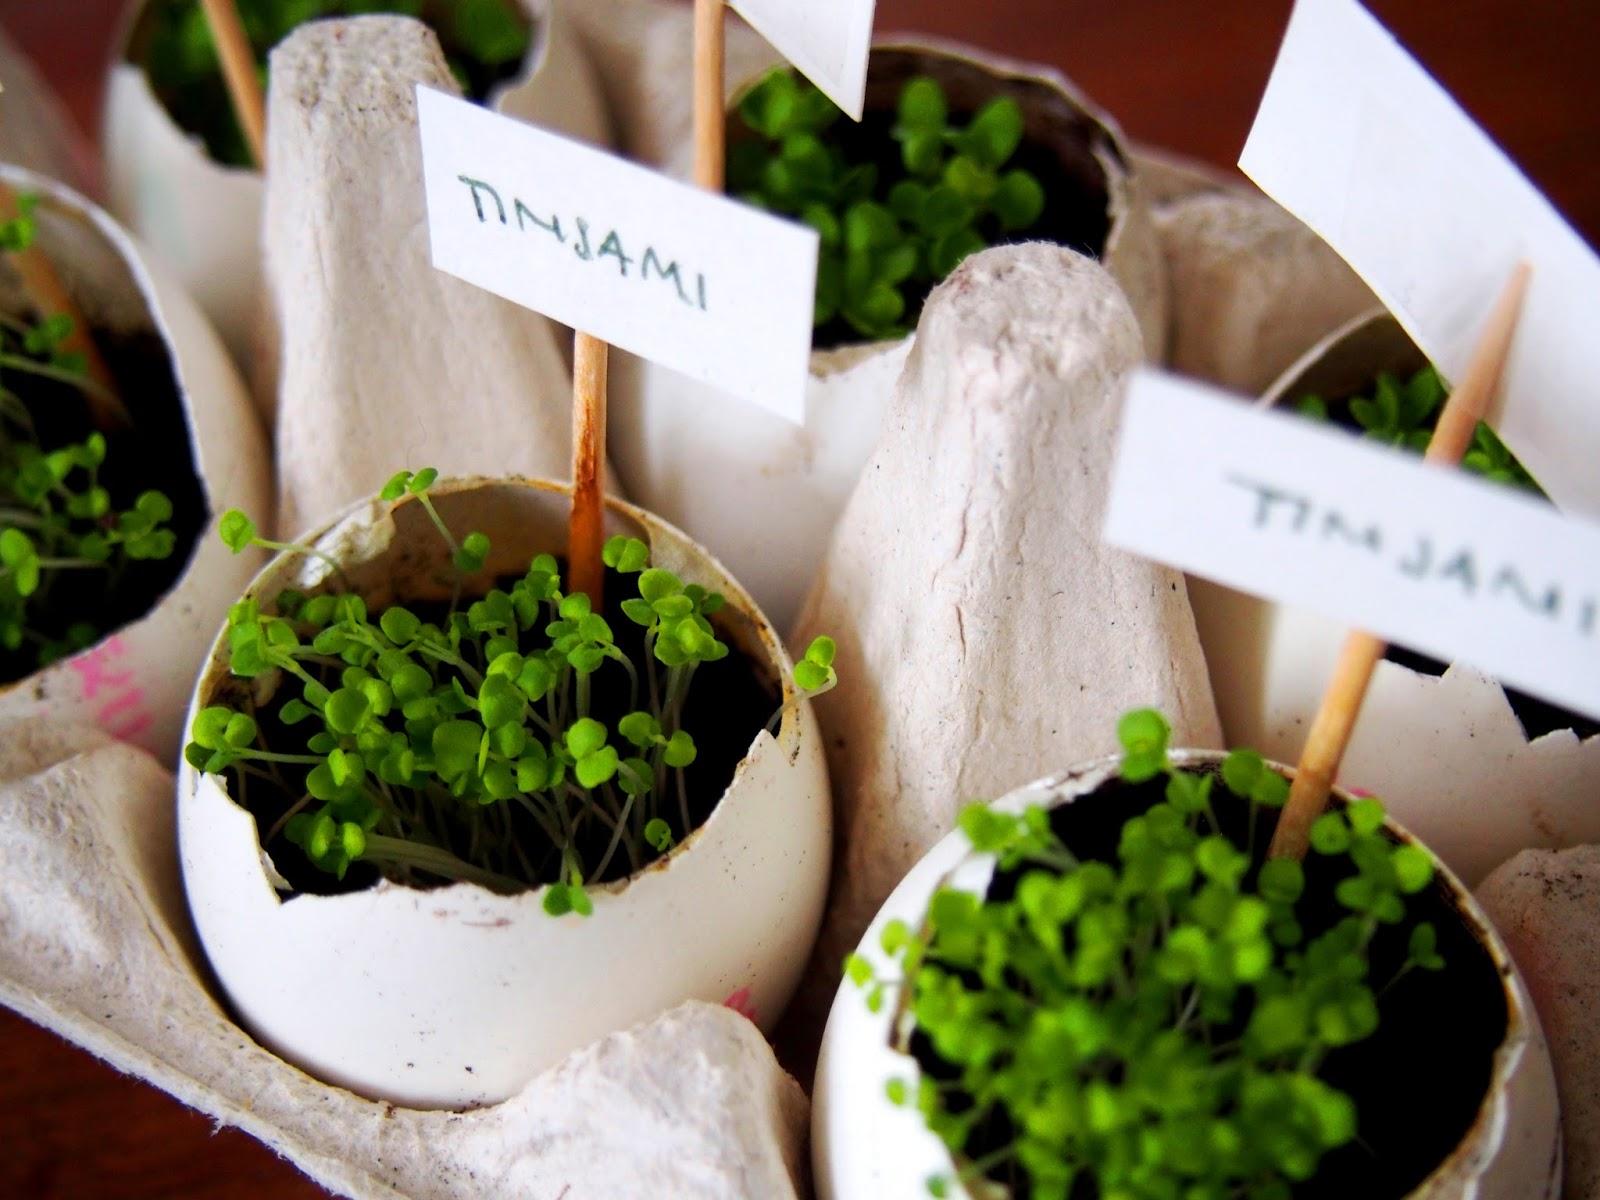 eggshell, garden, puutarha, istutus, muna, kuori, kananmuna, egg, shell, plant, kasvi, plantaasi, plantagen